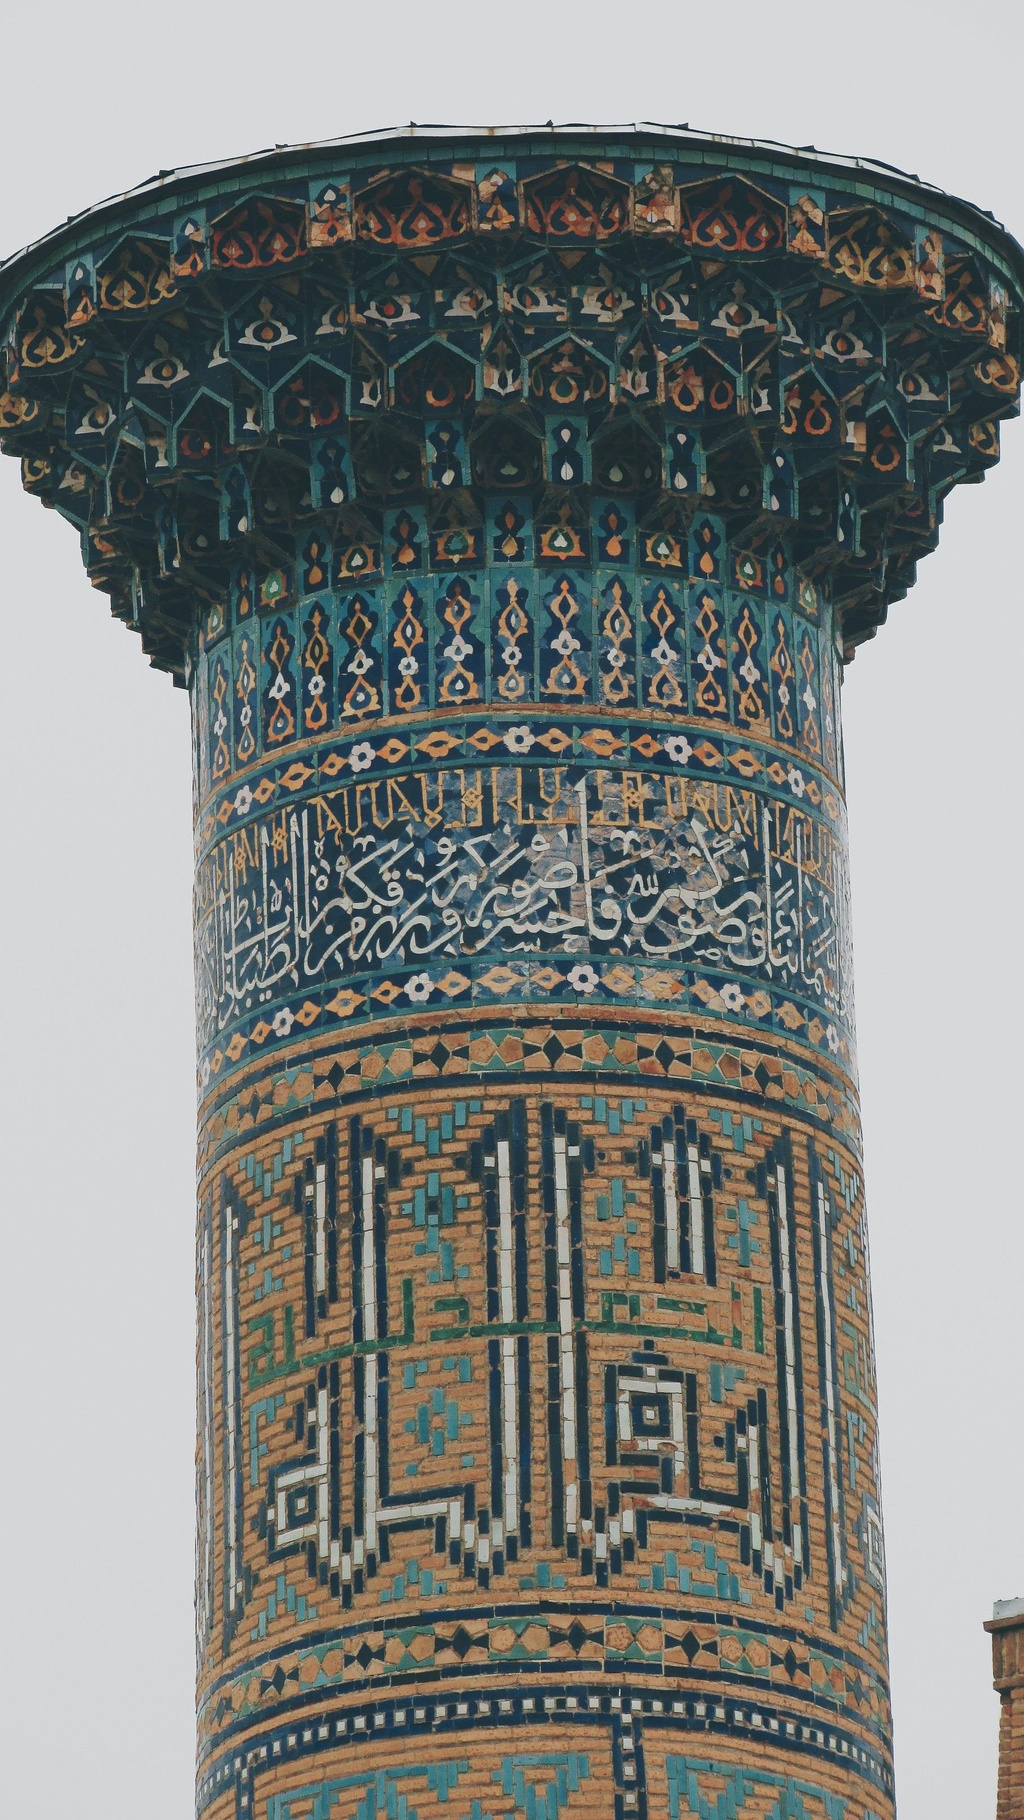 #Mytour: Uzbekistan va hanh trinh 13 ngay men theo Con duong To Lua hinh anh 2